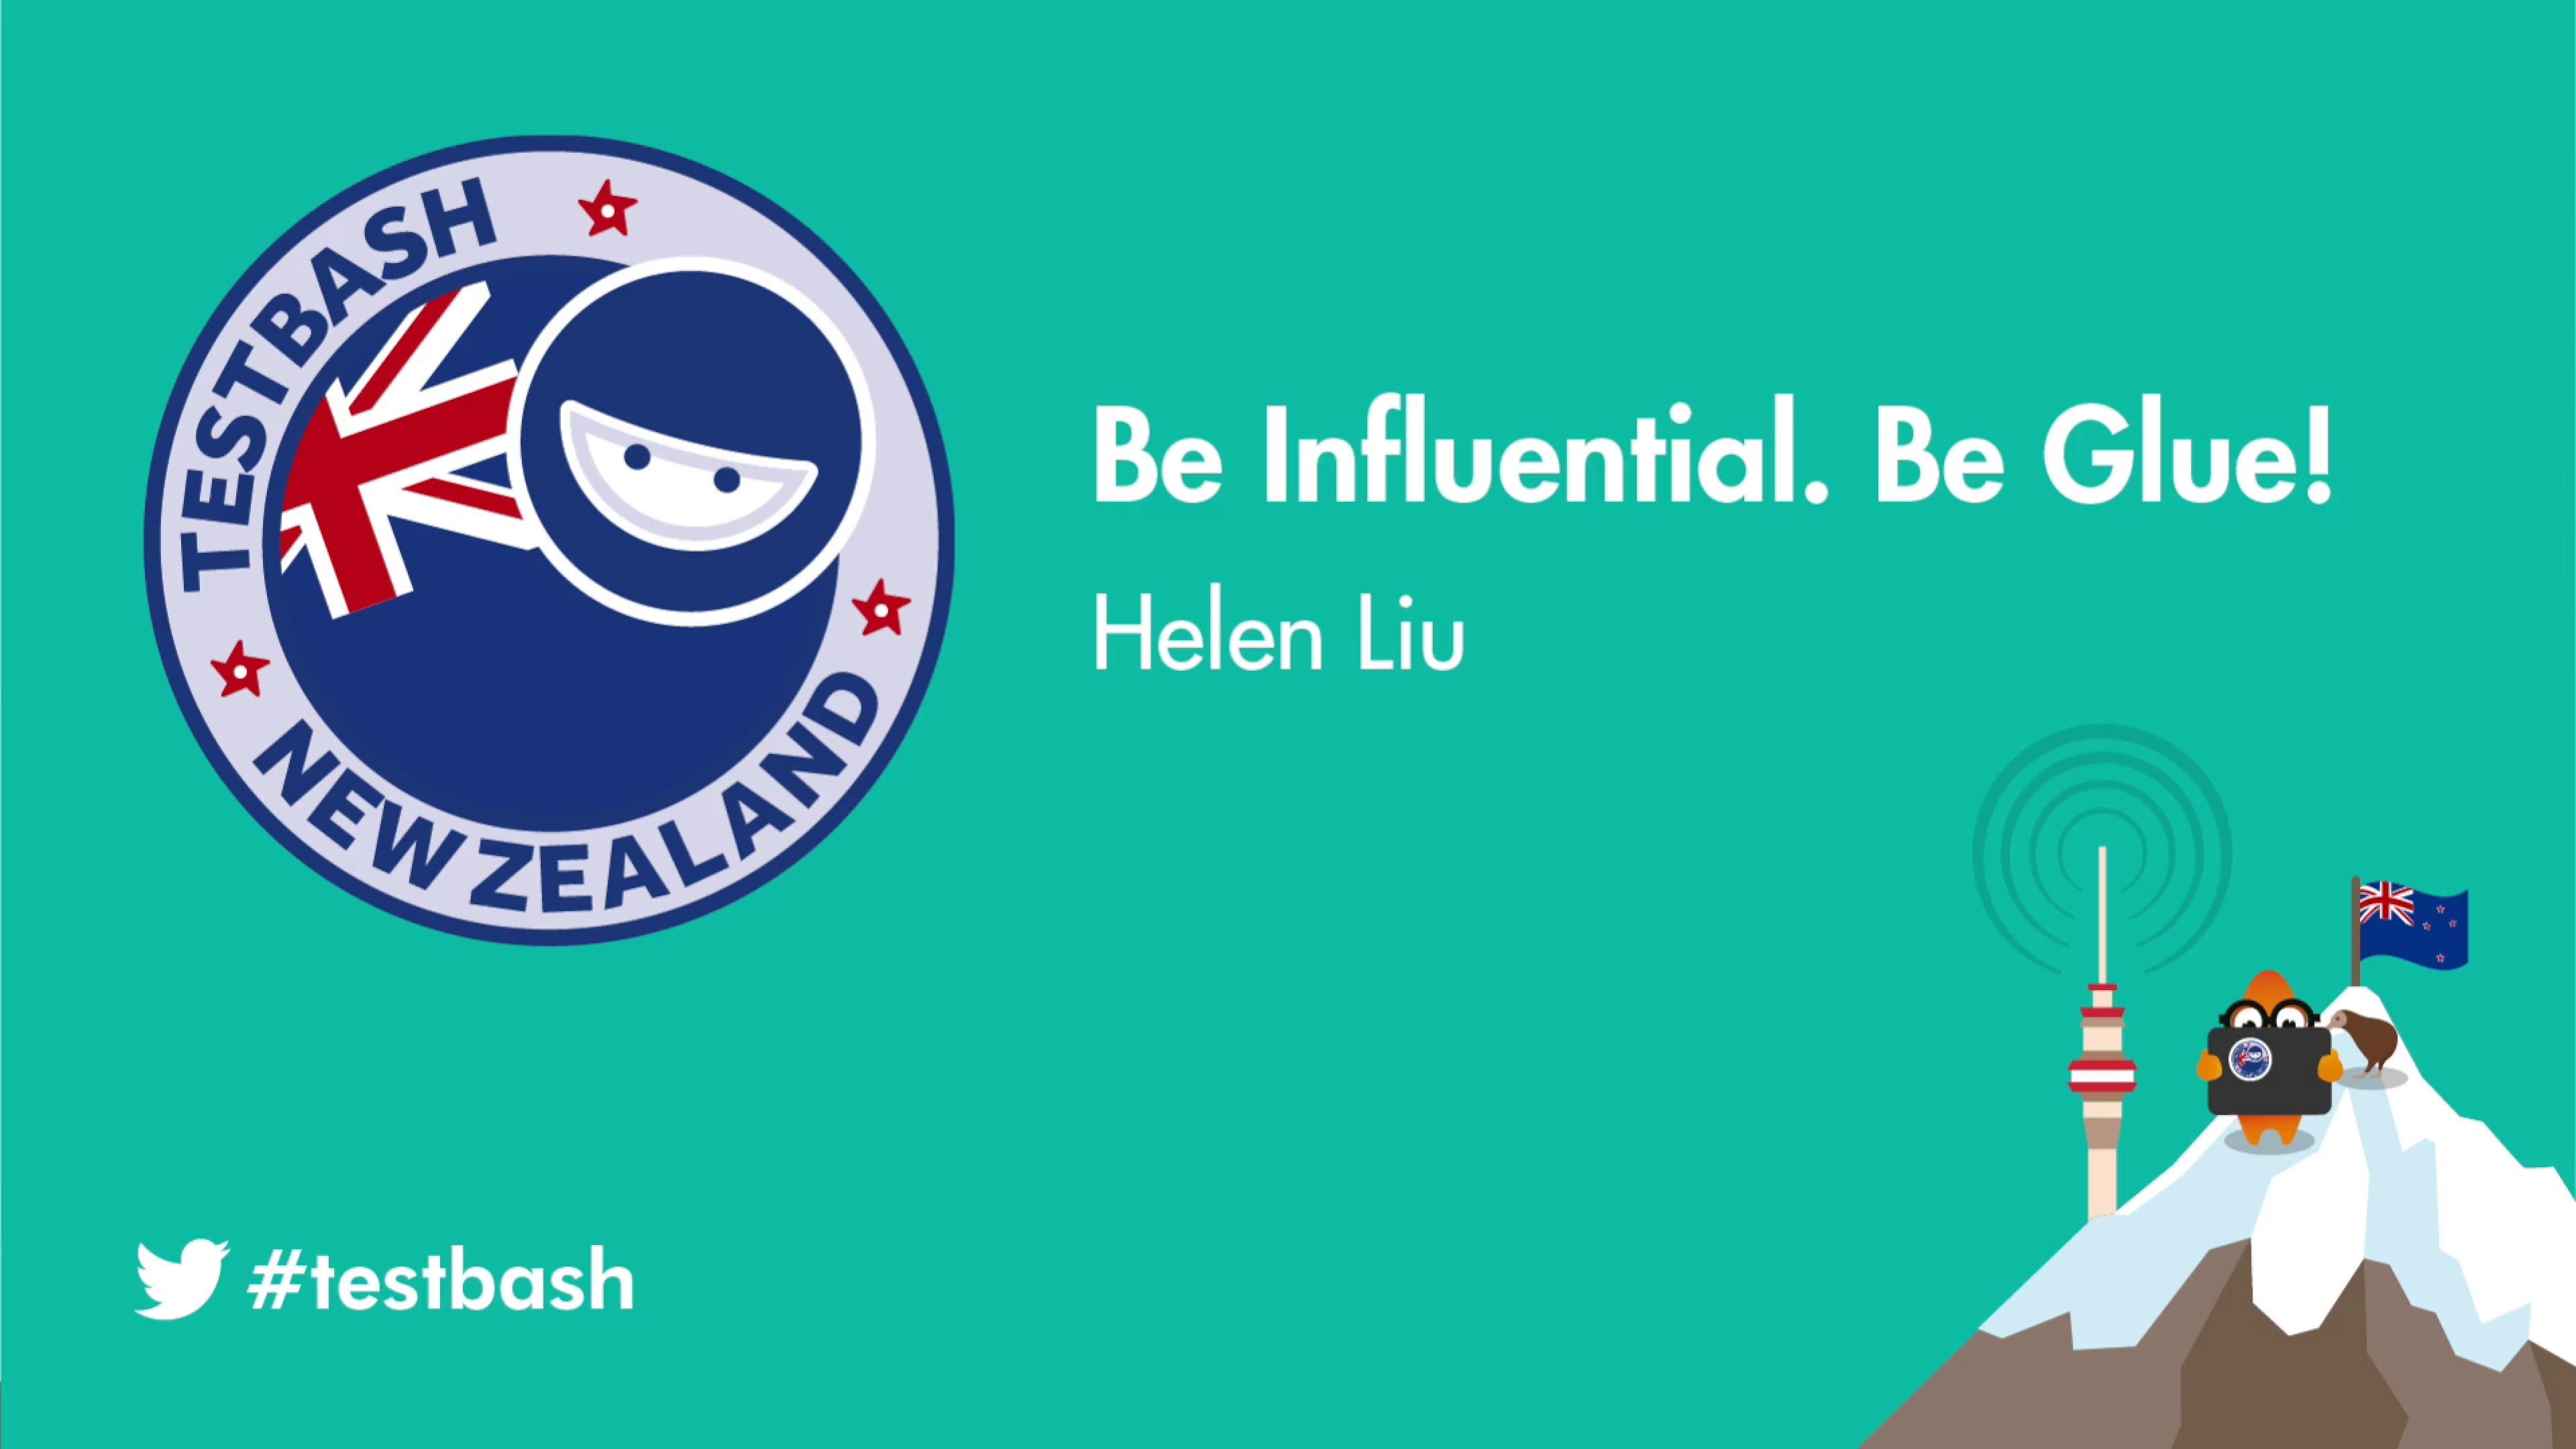 Be Influential. Be Glue! - Helen Liu